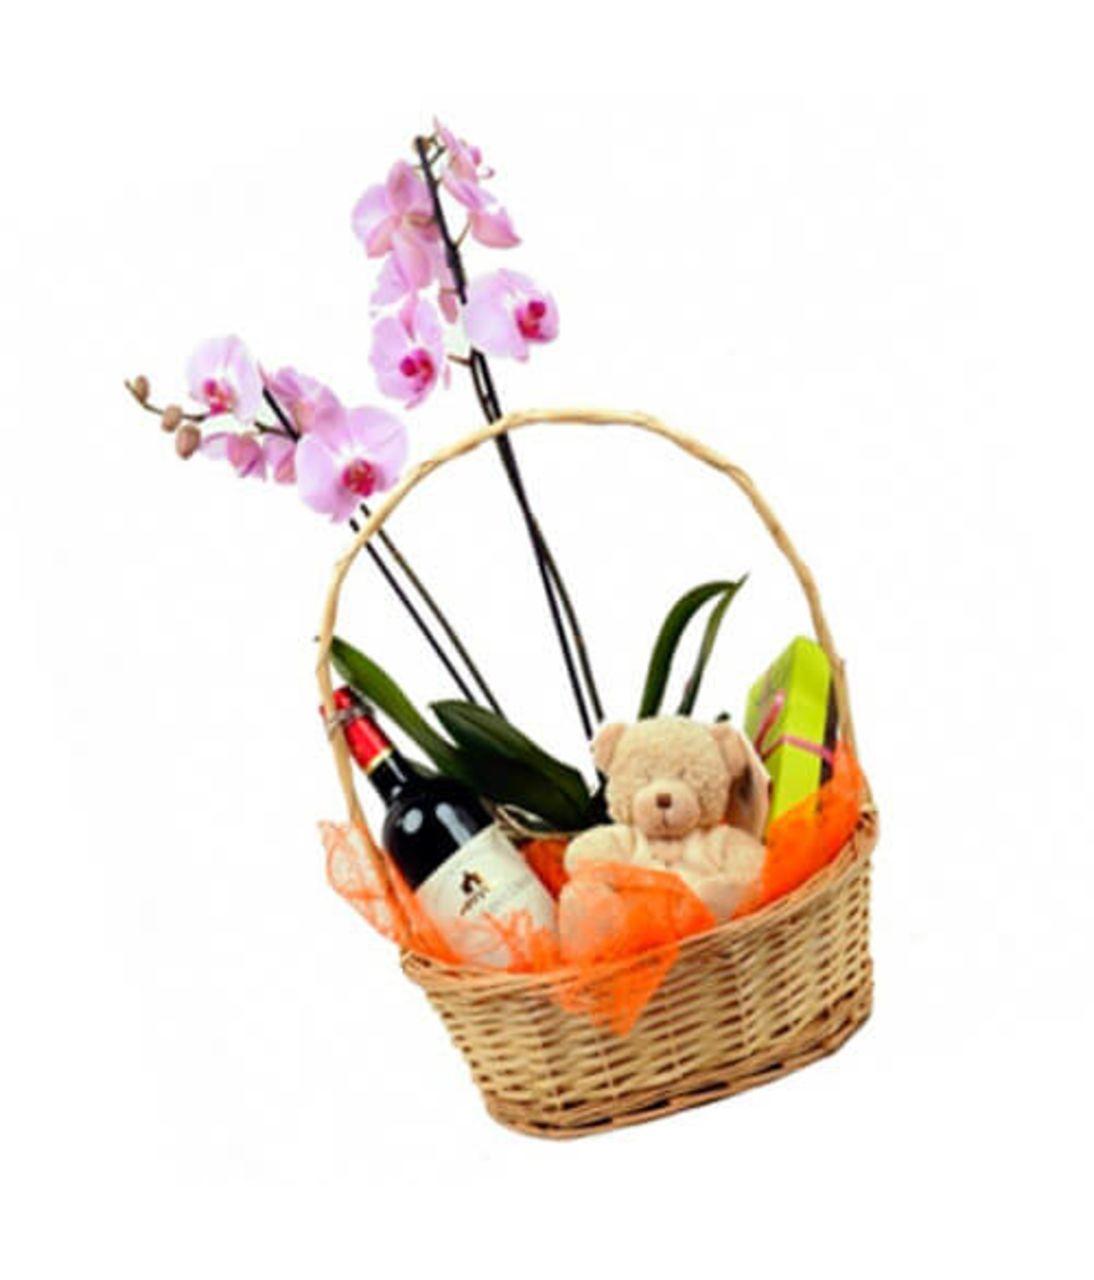 Орхідея в кошику з сюрпризом. Superflowers.com.ua.